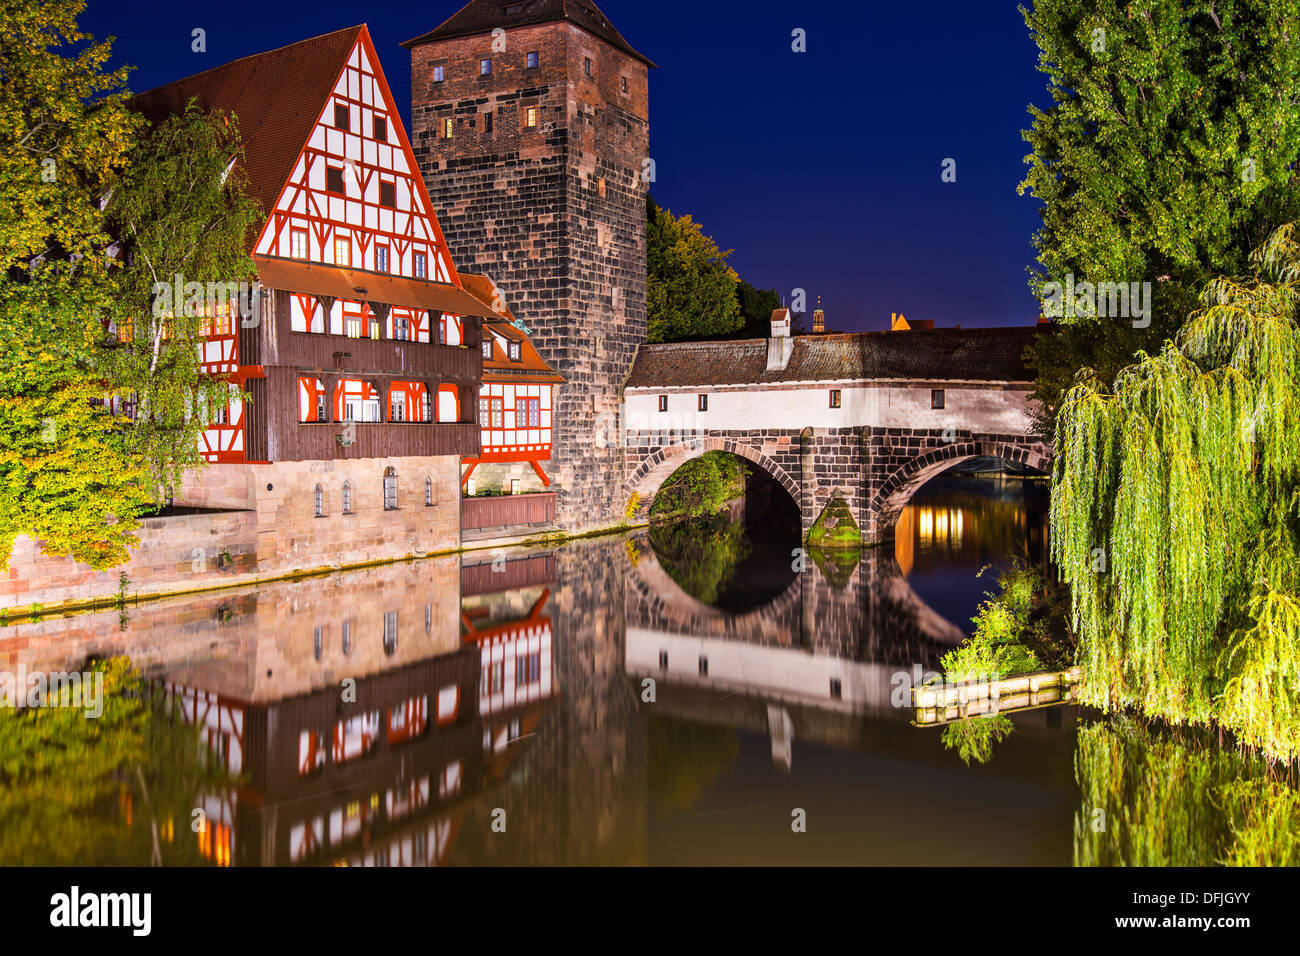 Des Henkers Bridge bei Nacht, Nürnberg, Deutschland Stockbild